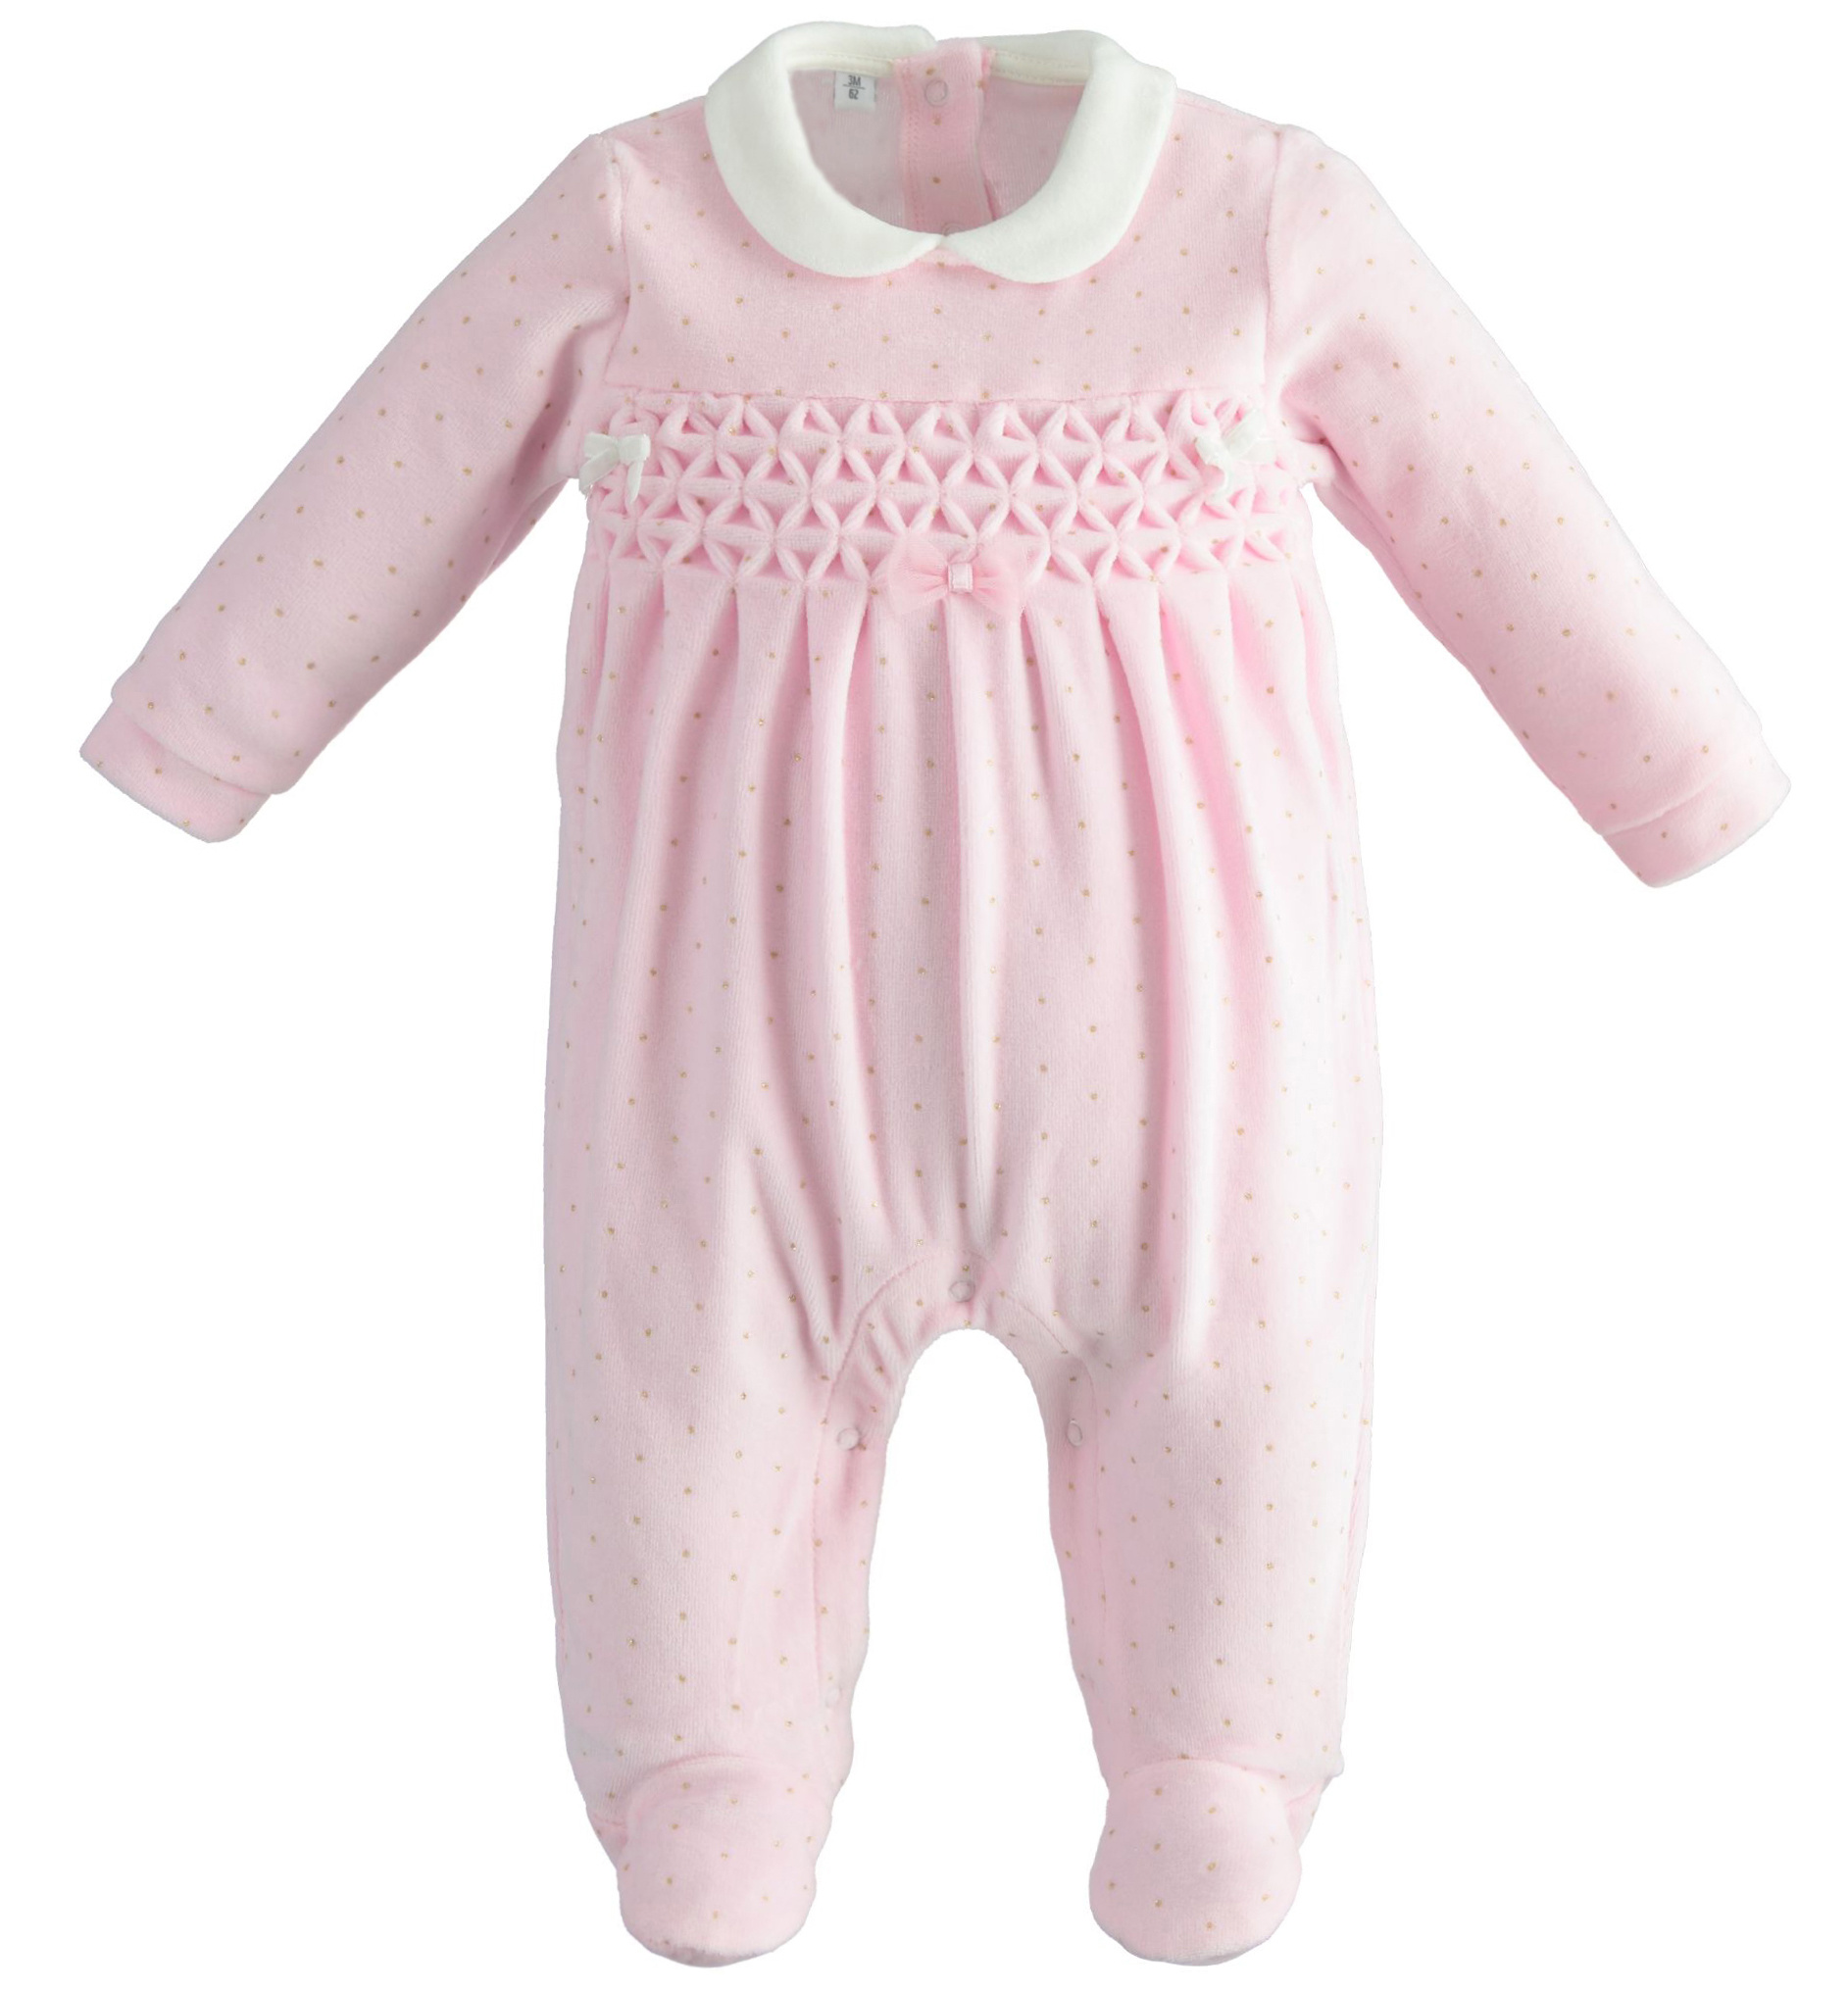 Ido iDO Pink Velour Bow Babygrow - 43258